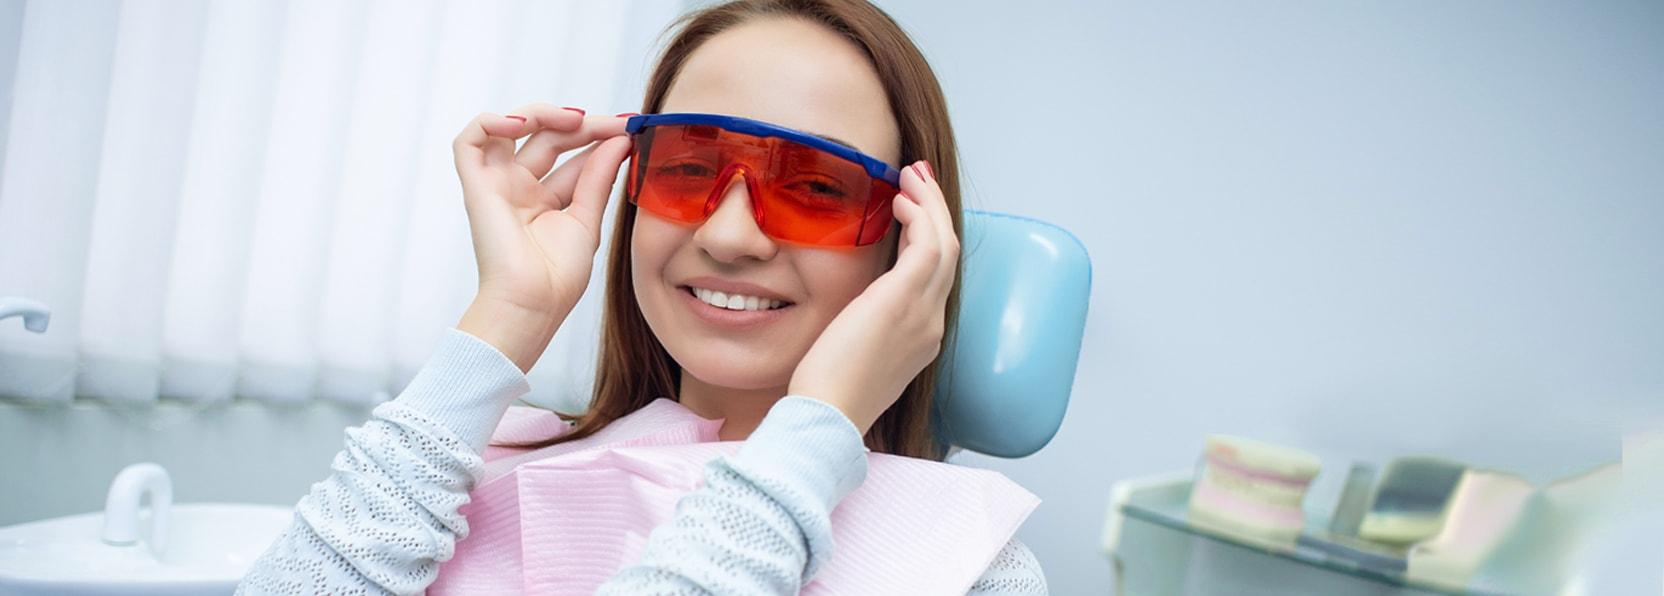 Dentist Walk-In Toronto   Walk-In Dental Clinic   emergency